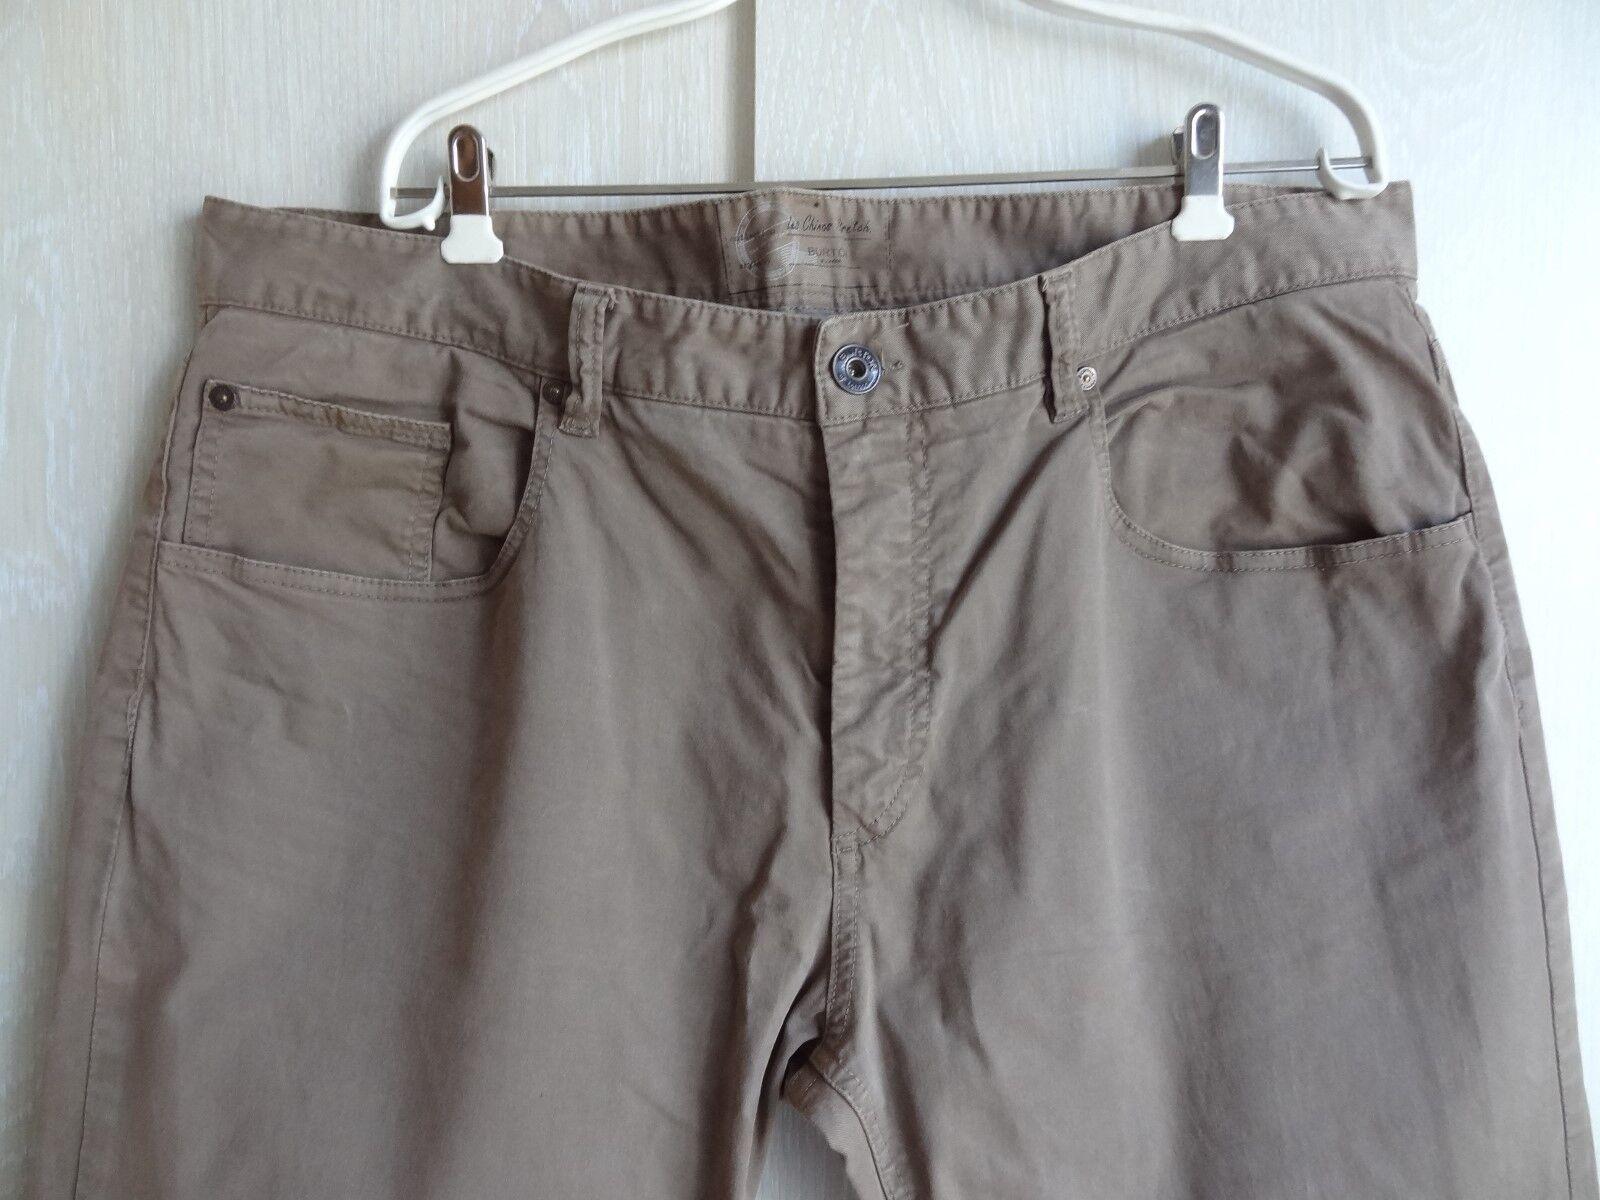 Pantalon Of 962beb Burton 50 London Marron Taille RrqUxzR